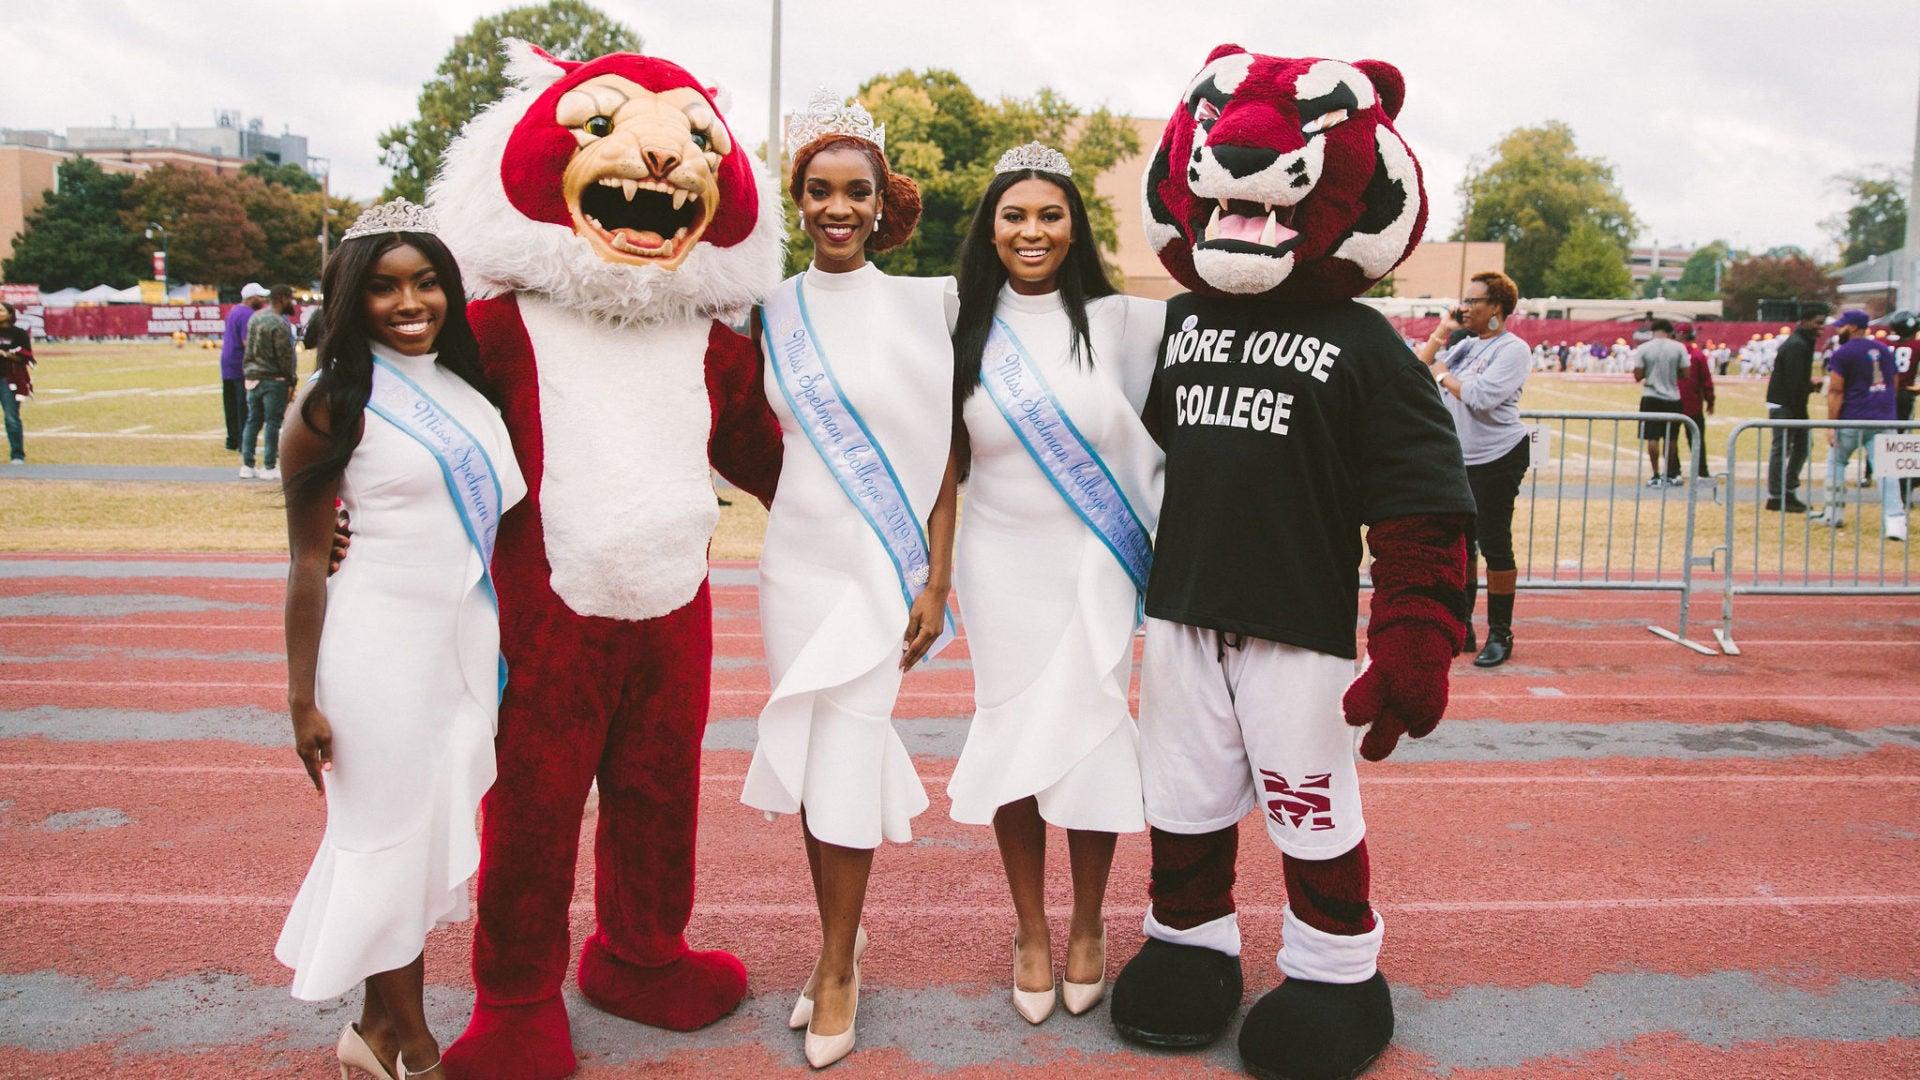 Best Photos From Spelhouse Homecoming Weekend 2019